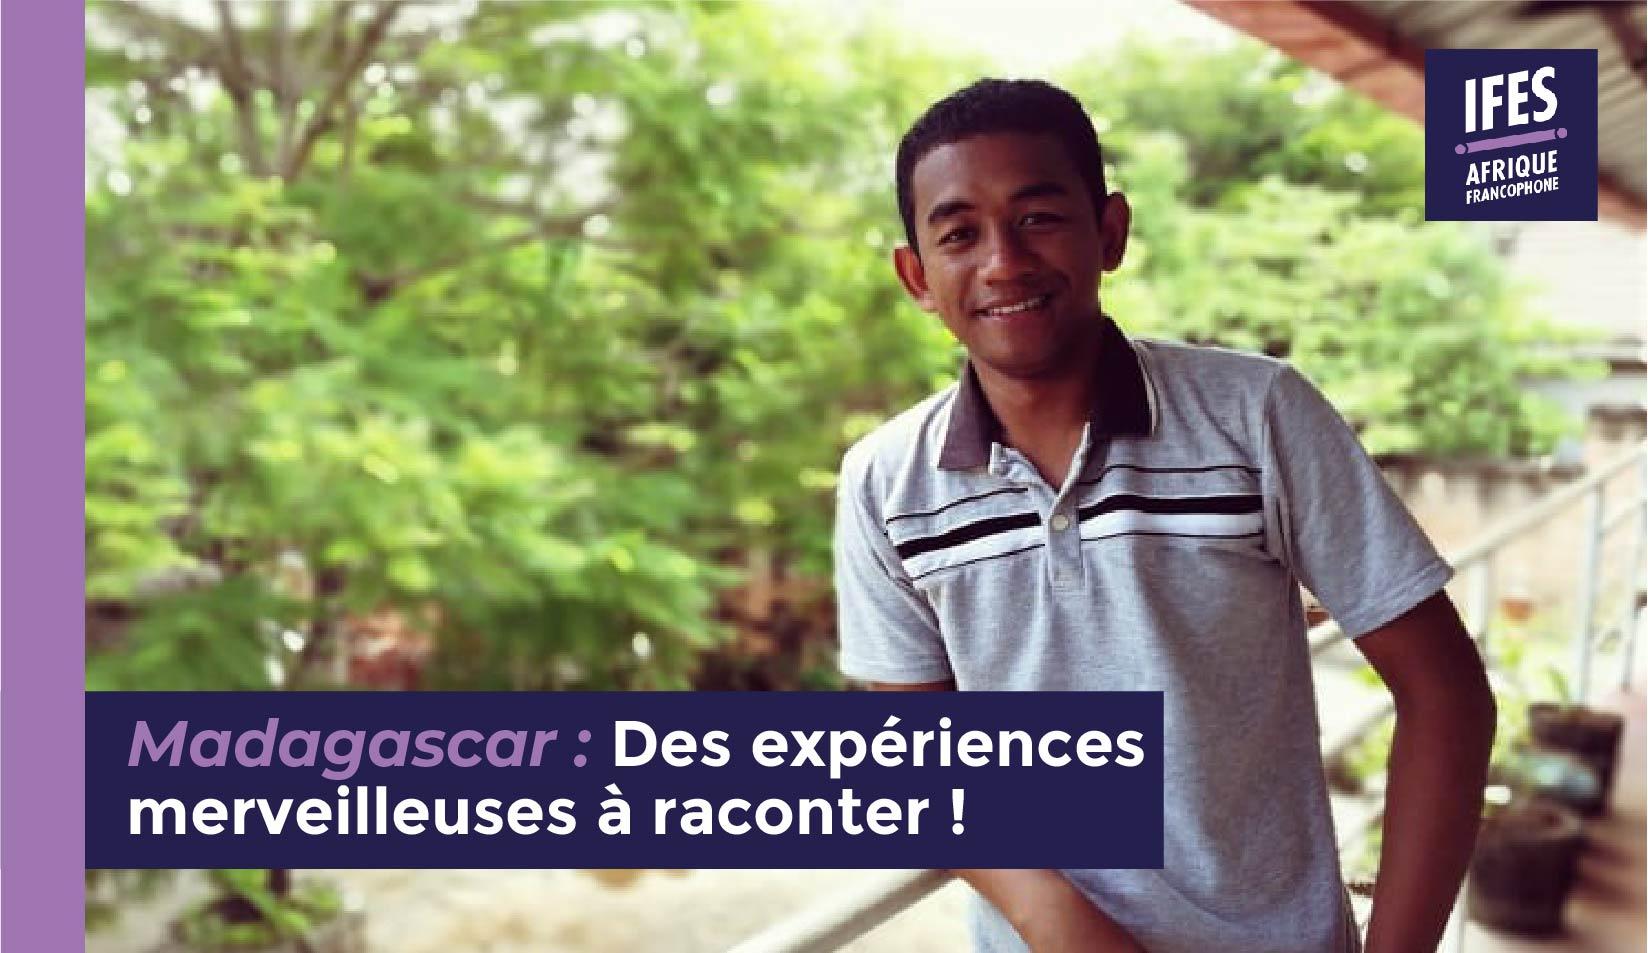 Madagascar : Des expériences merveilleuses à raconter!